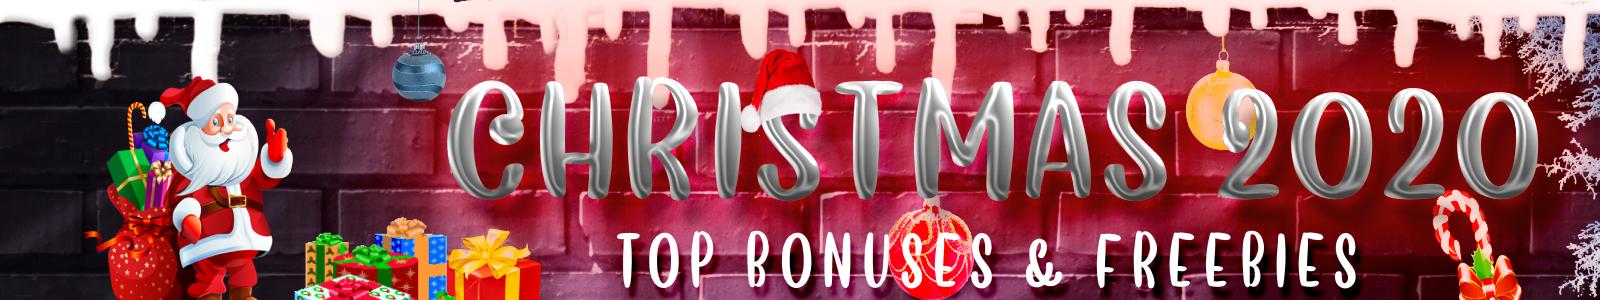 nodeposit-casino-bonus-christmas2020